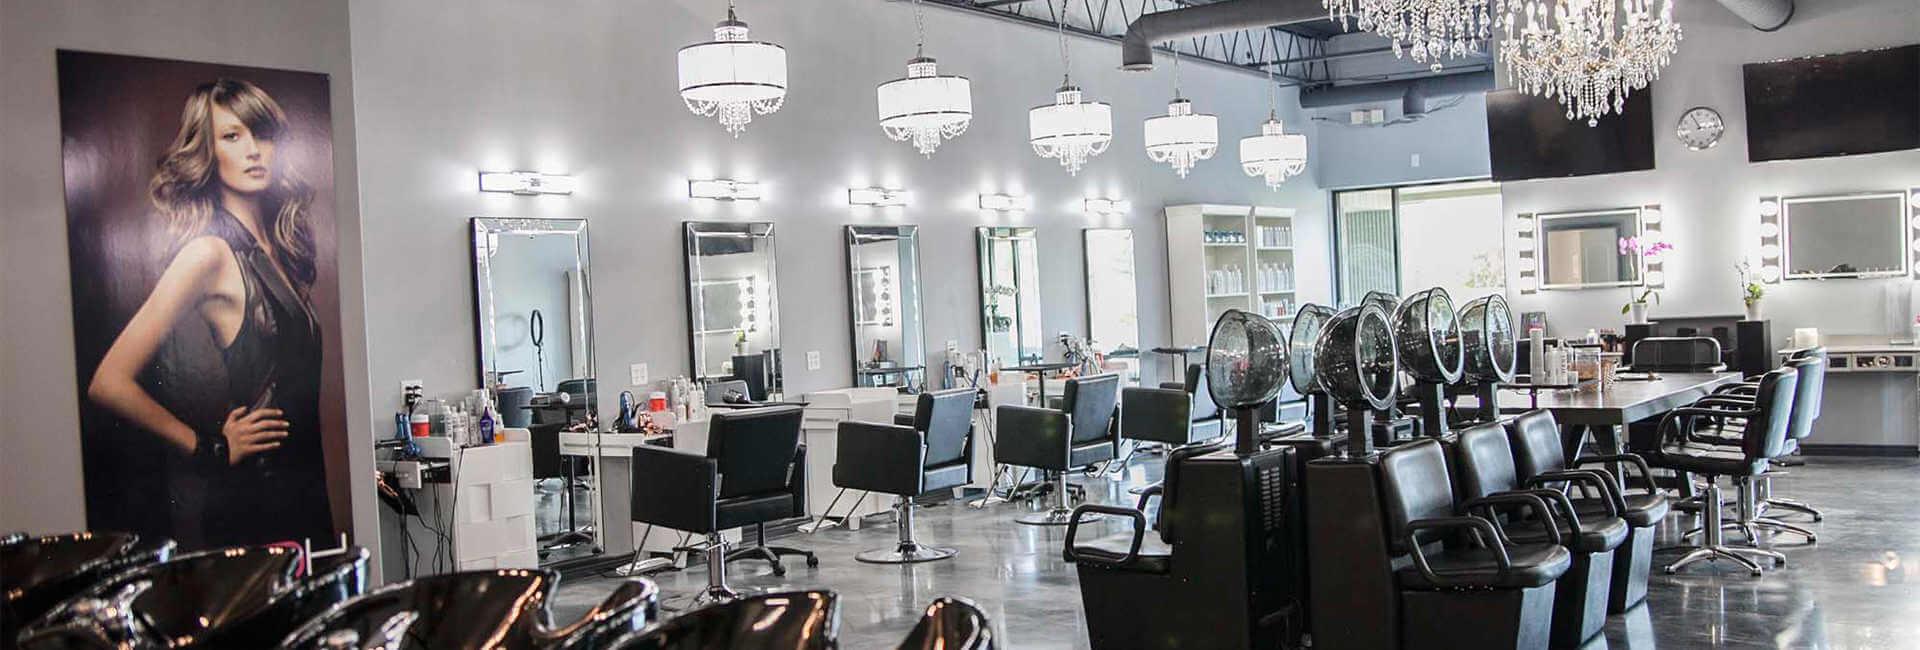 Image of the interior of HQ Salon